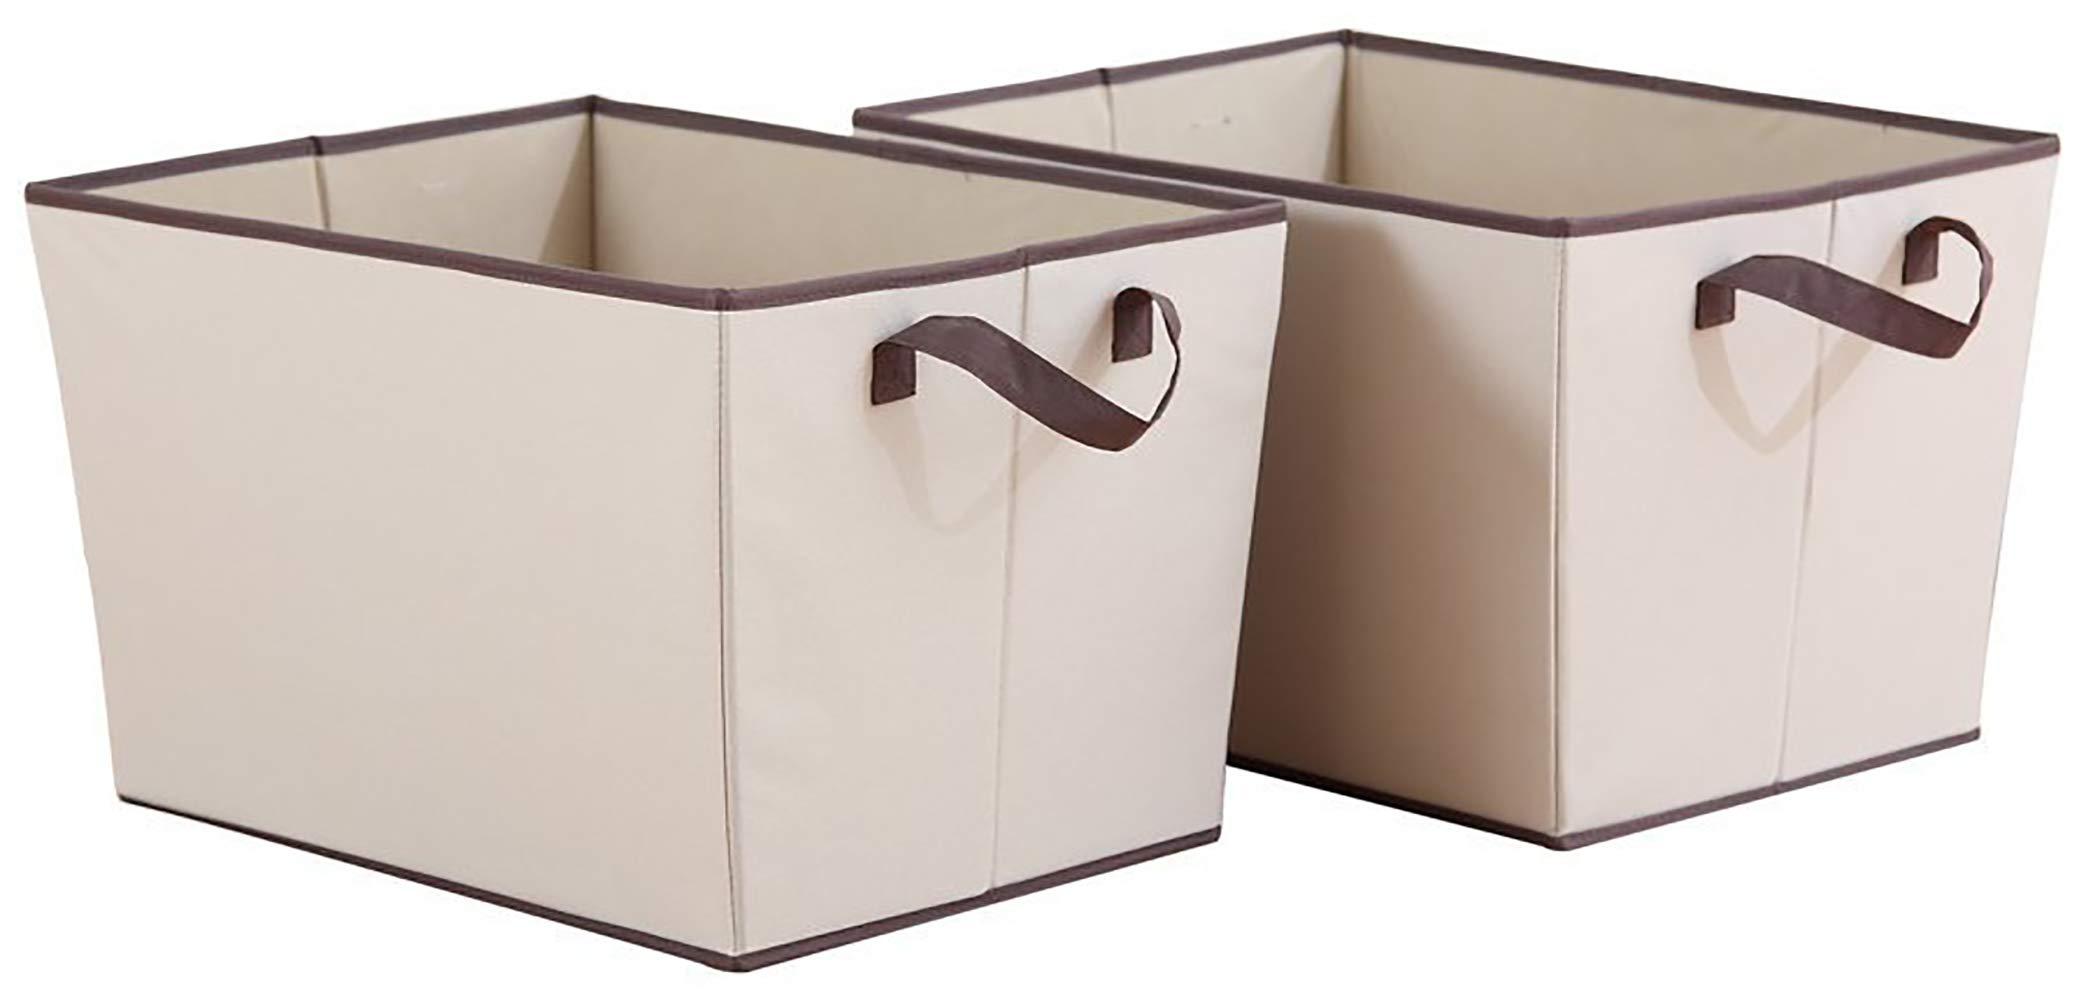 STORAGE MANIAC XL Storage Baskets Rectangular Open Storage Bins Polyester Canvas Foldable Container with 2 Handles by STORAGE MANIAC